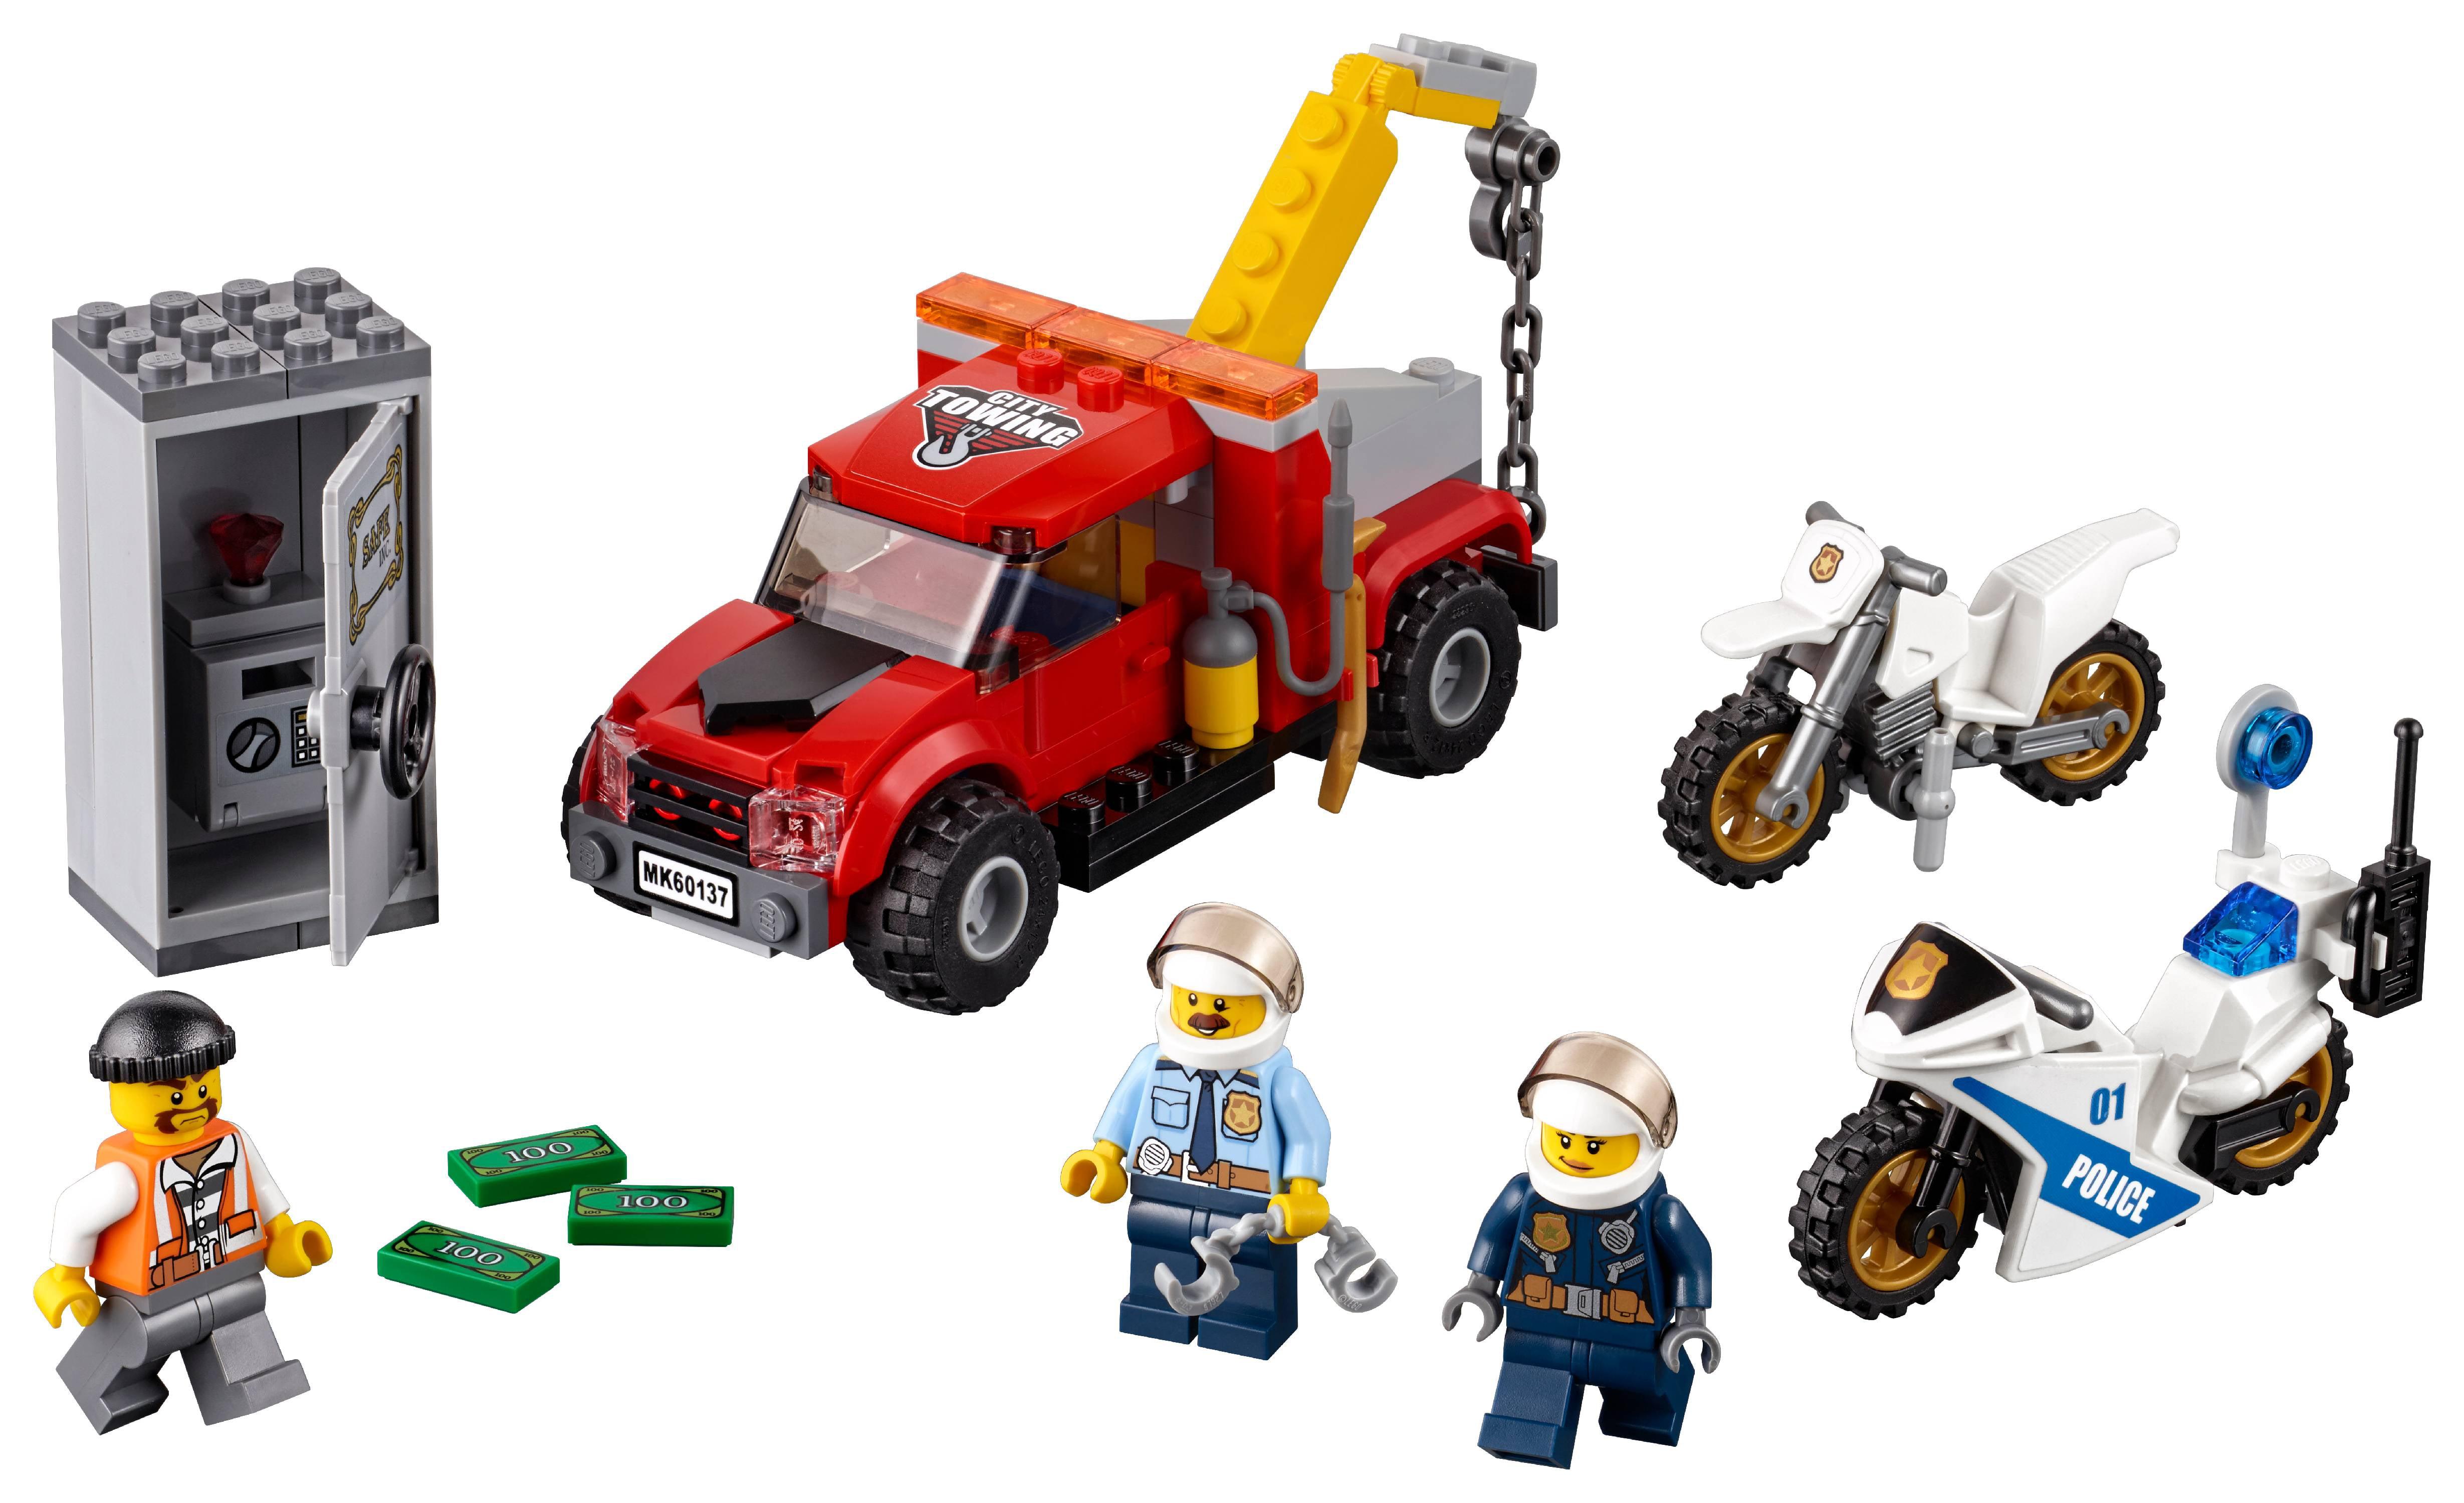 LEGO City Police Tow Truck Trouble 60137 - Walmart.com - Walmart.com